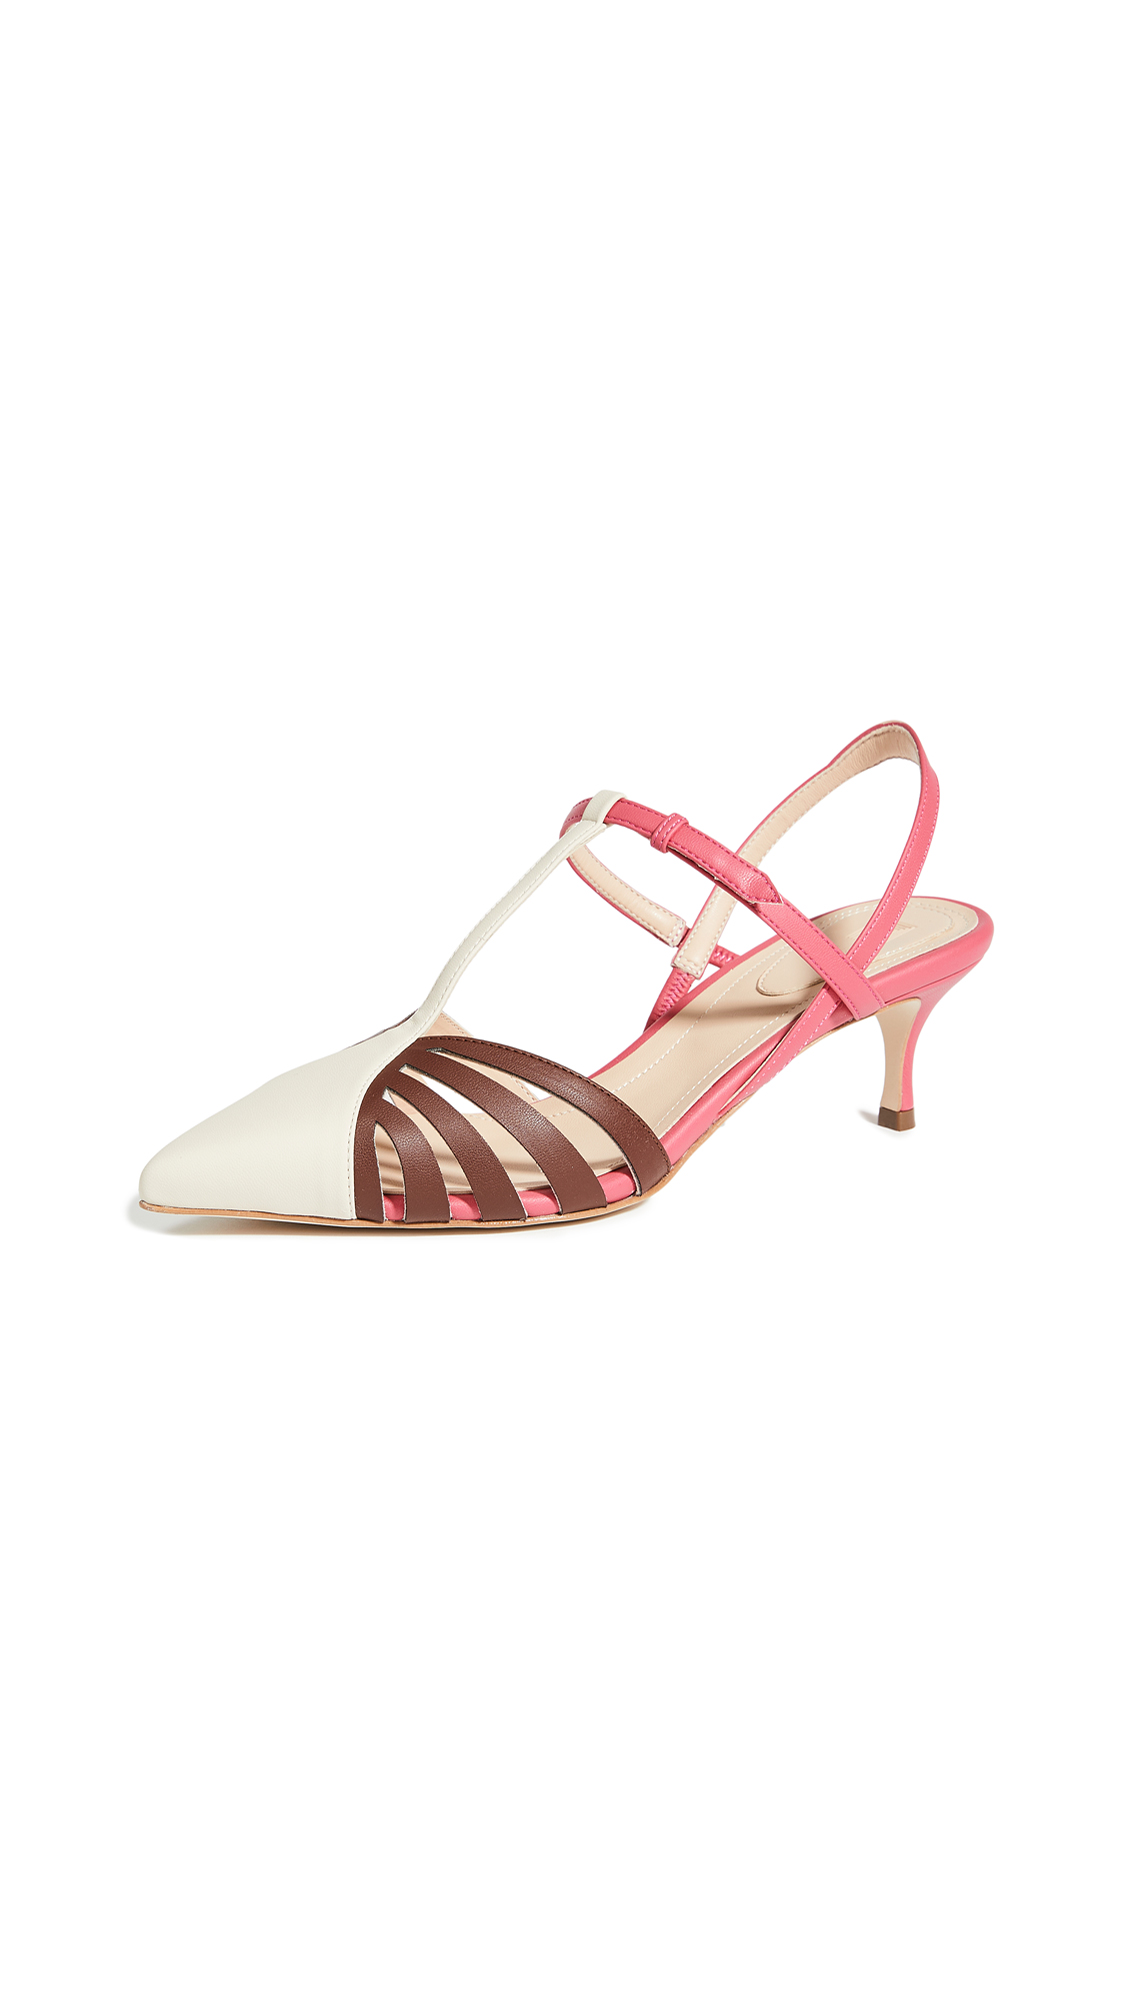 Rosie Assoulin Charisse Slingback Lattice Heels – 40% Off Sale